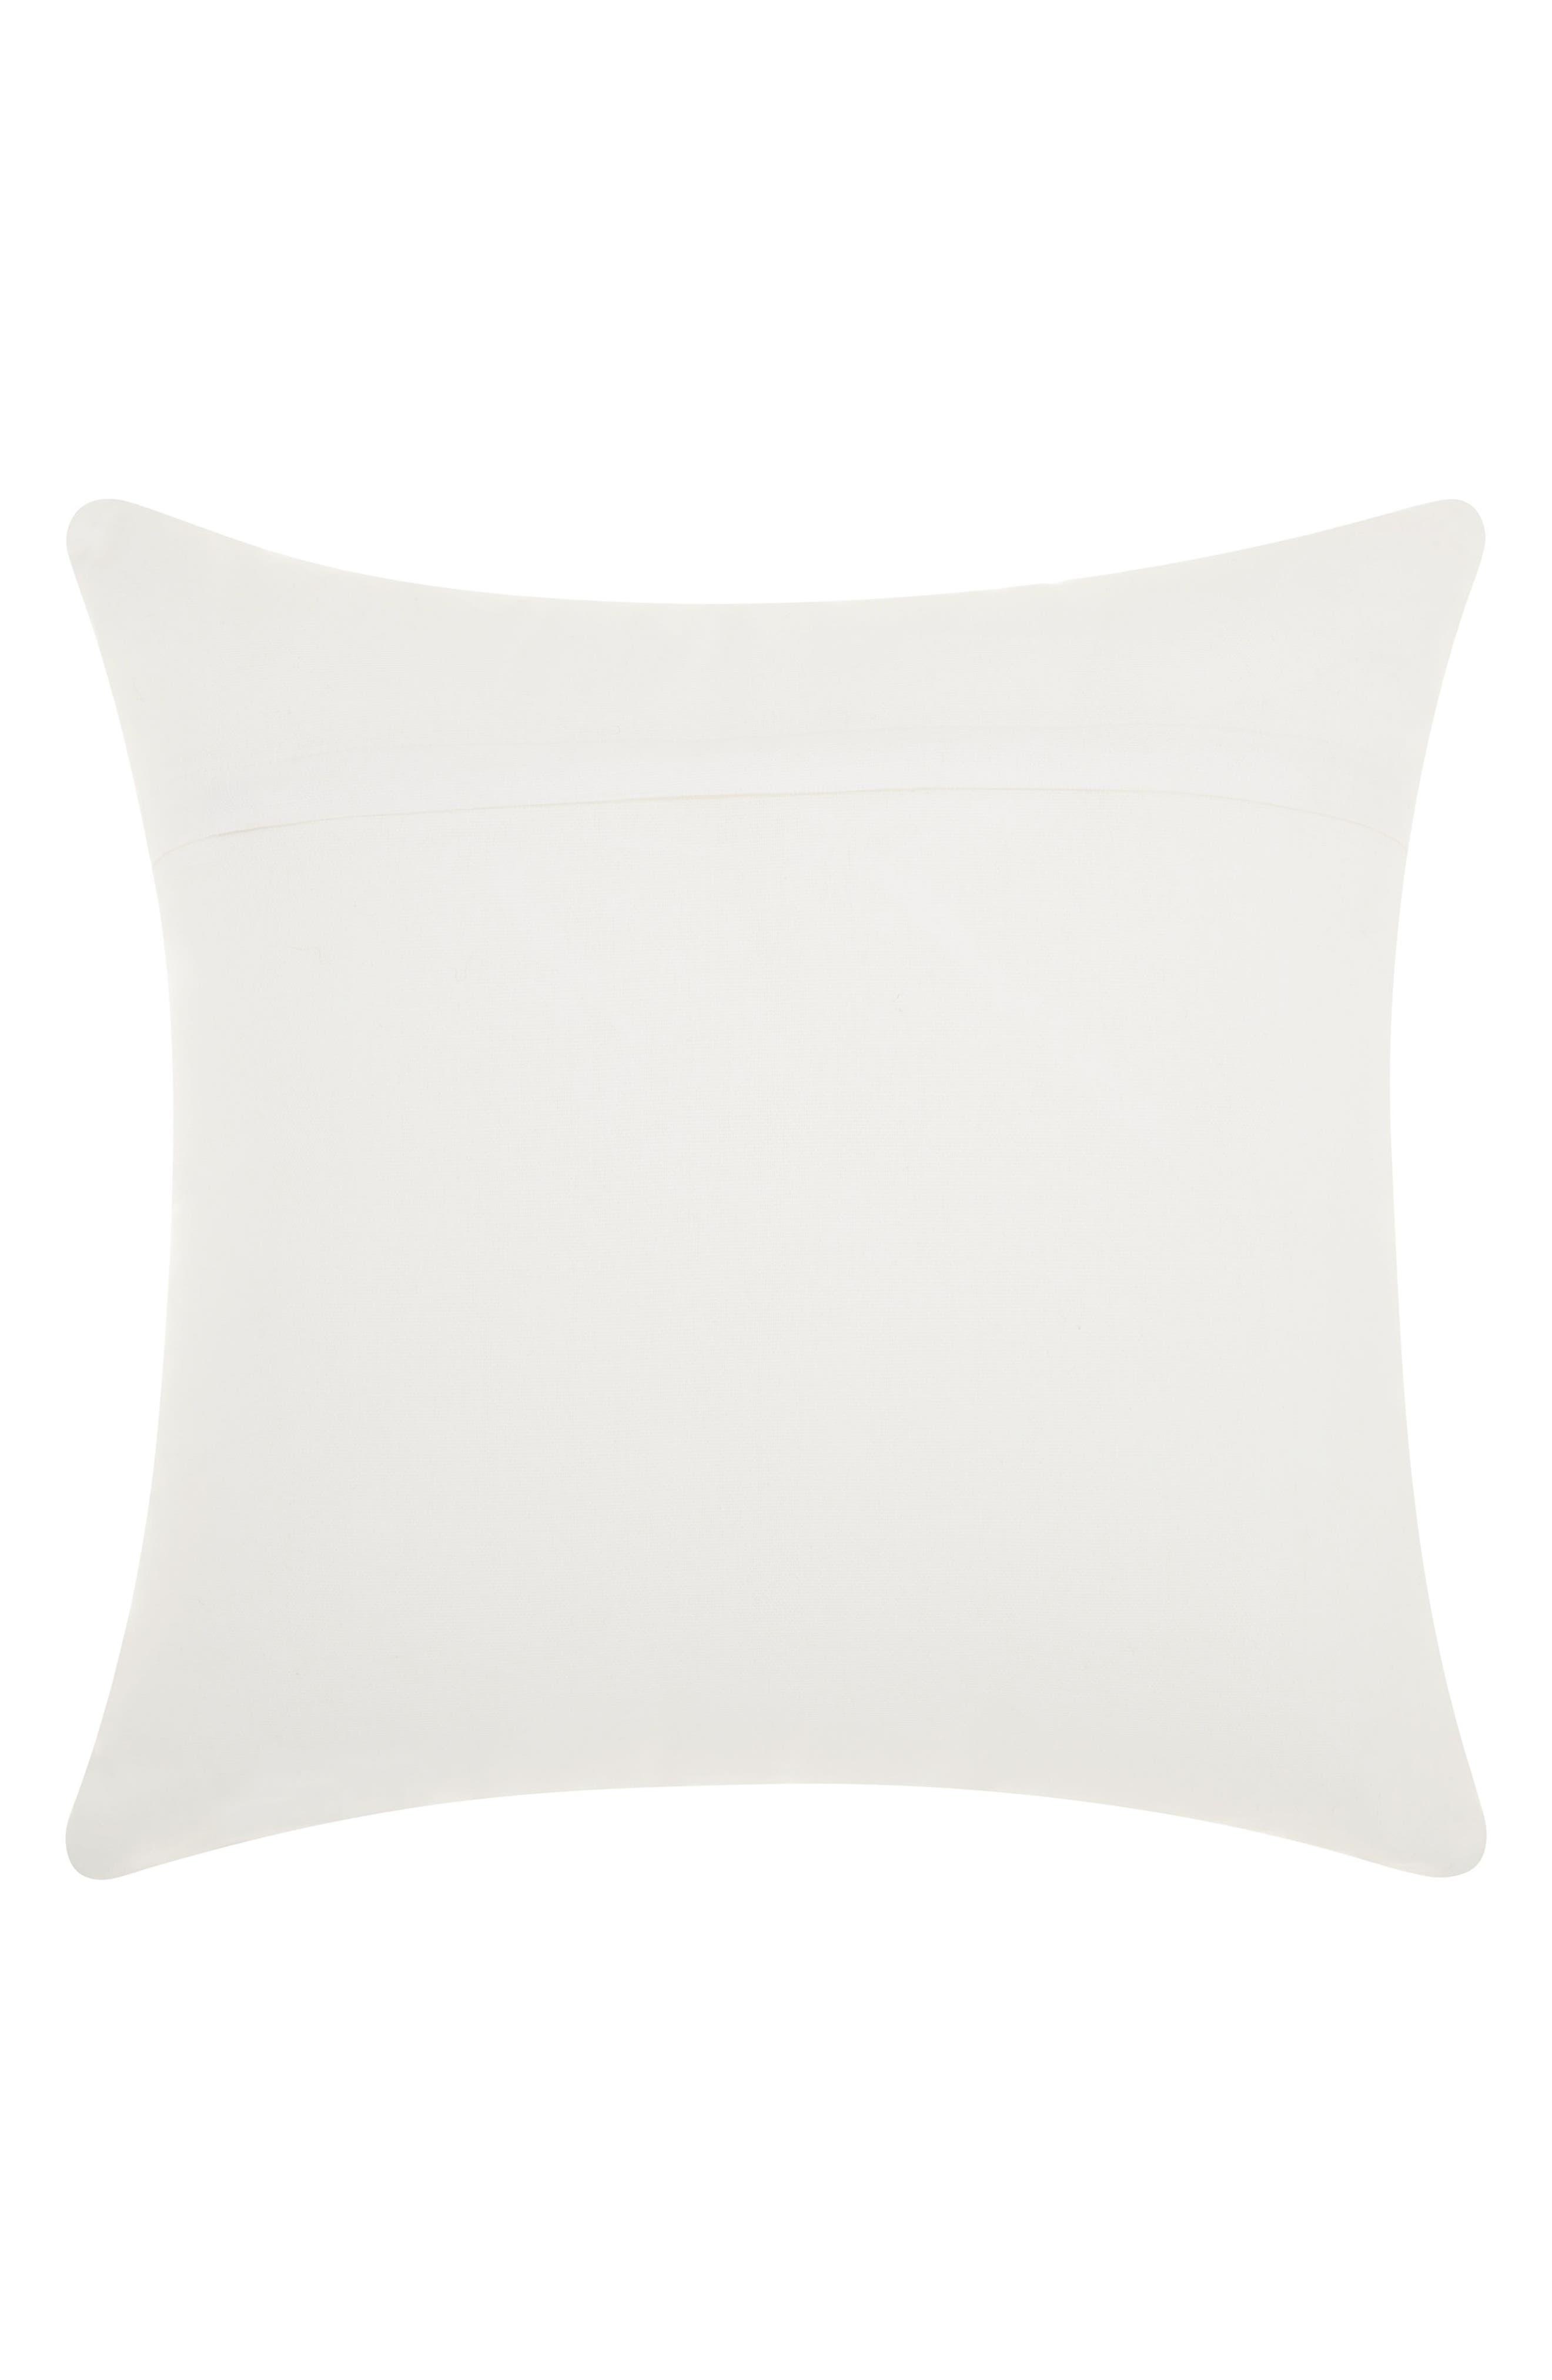 MINA VICTORY,                             Sequin Dalmatian Accent Pillow,                             Alternate thumbnail 2, color,                             100